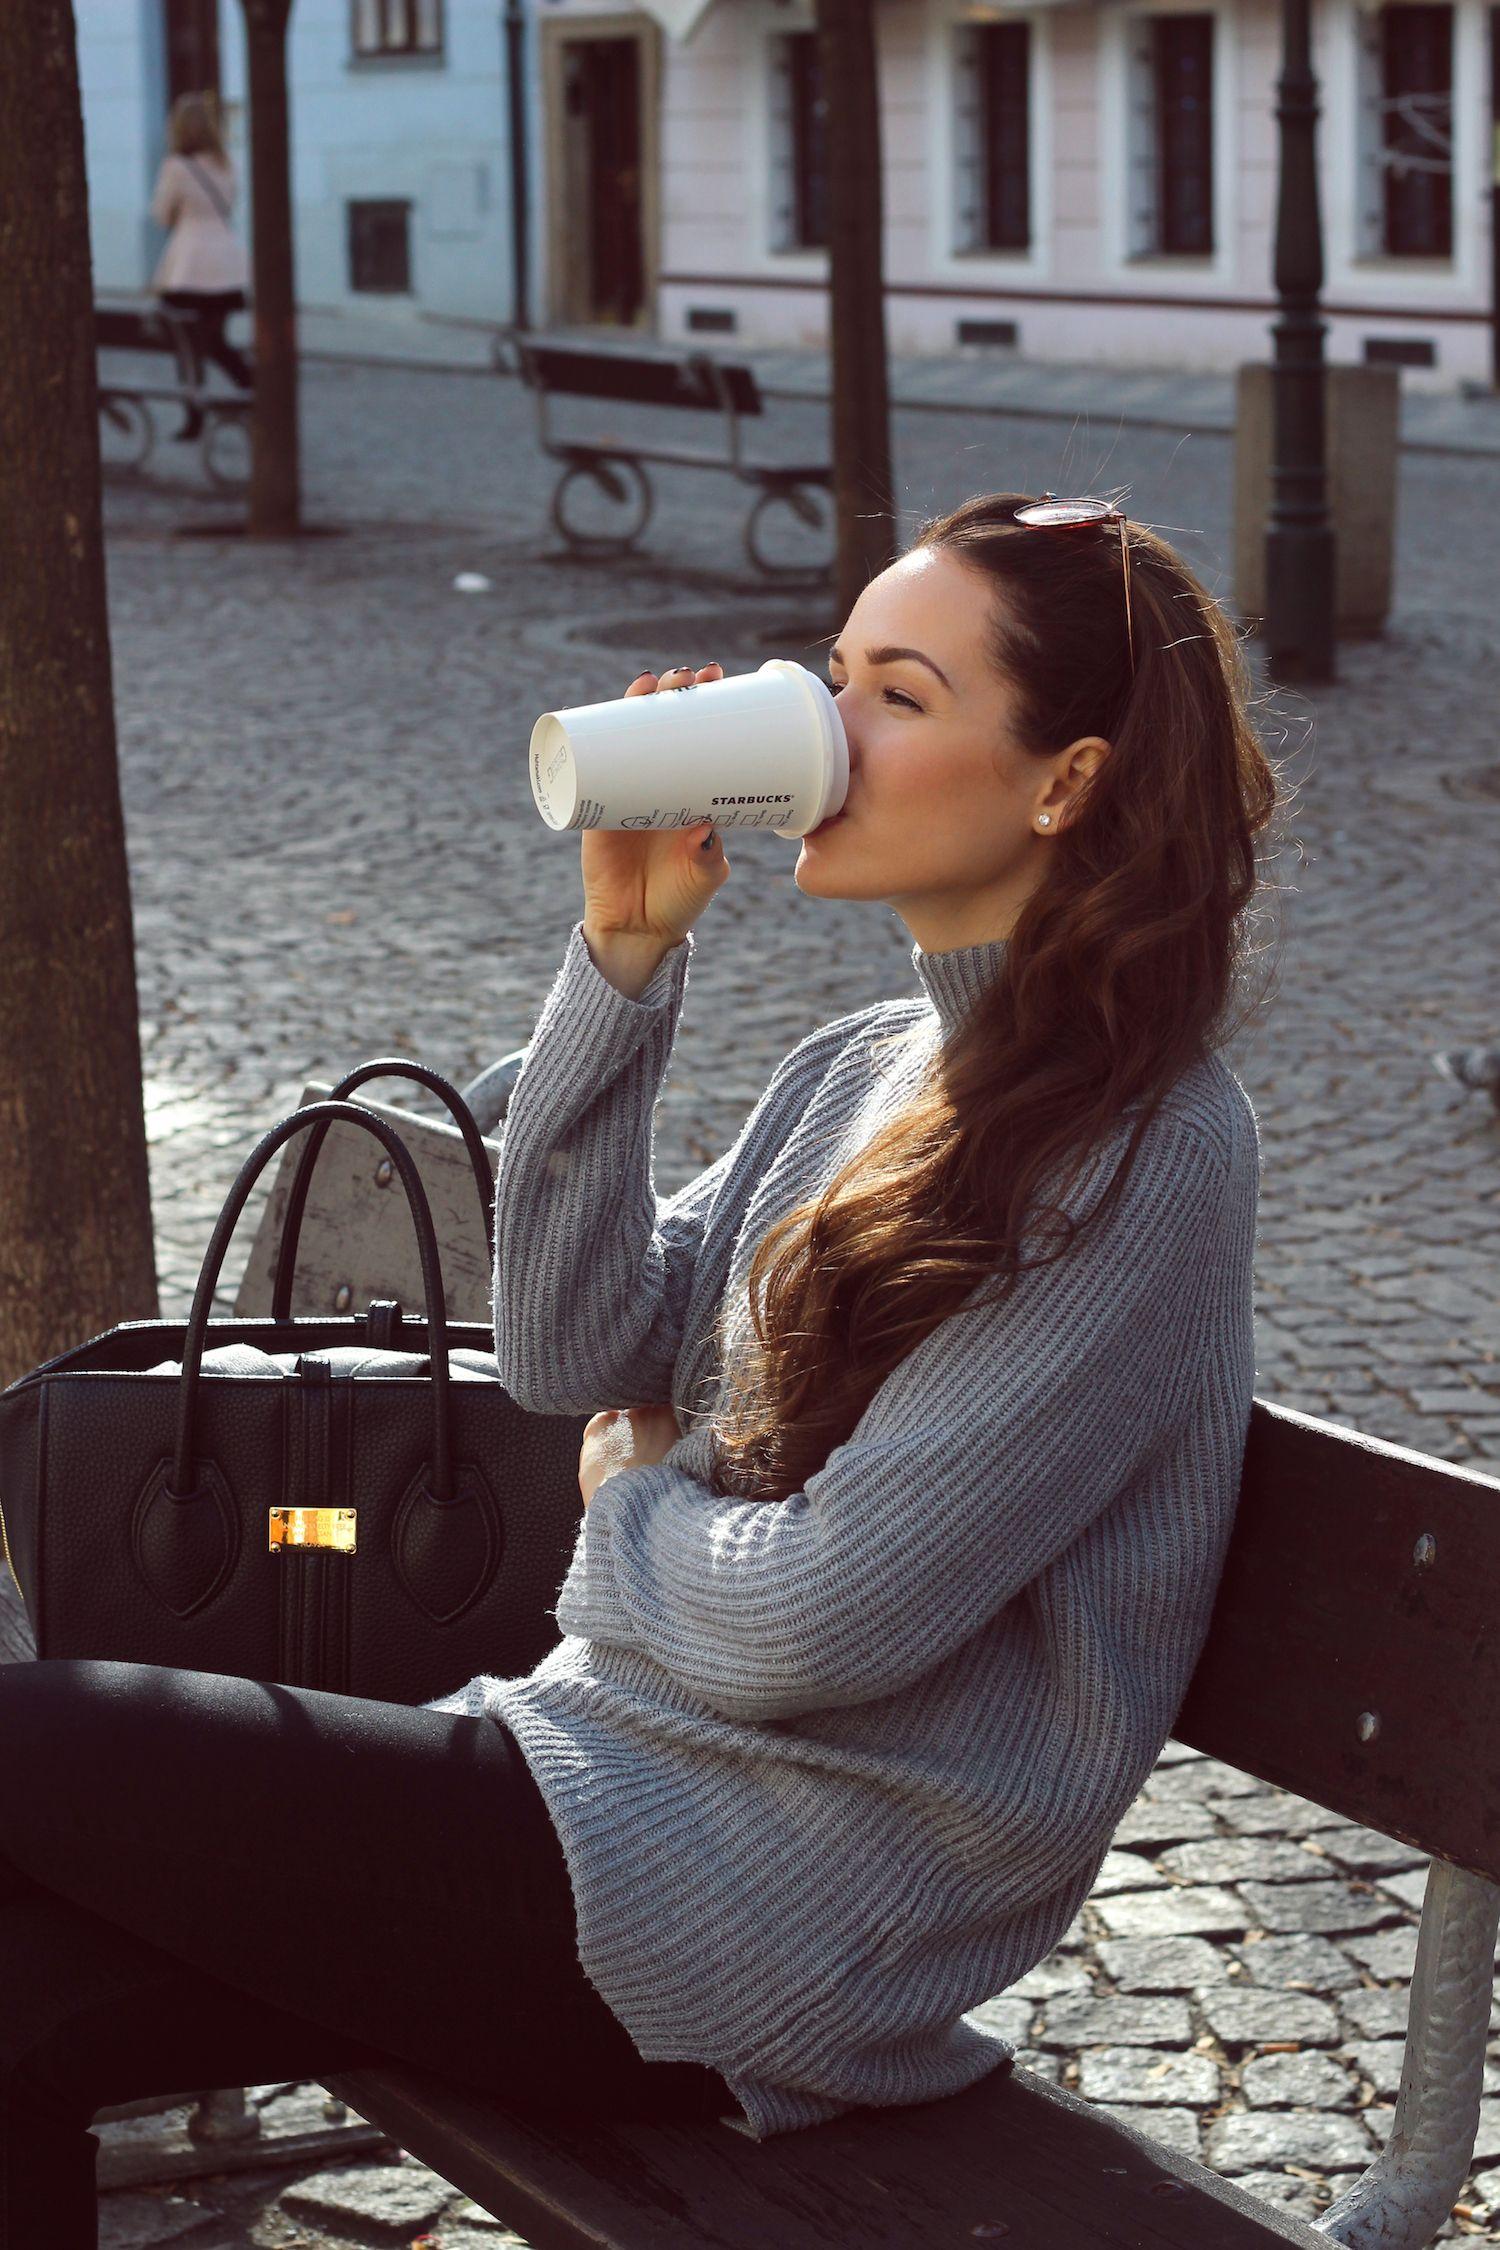 Simple basic outfit, fashion, Marketa Frank, blogger, fashion blogger, spring outfit, Prague, long hair, woman